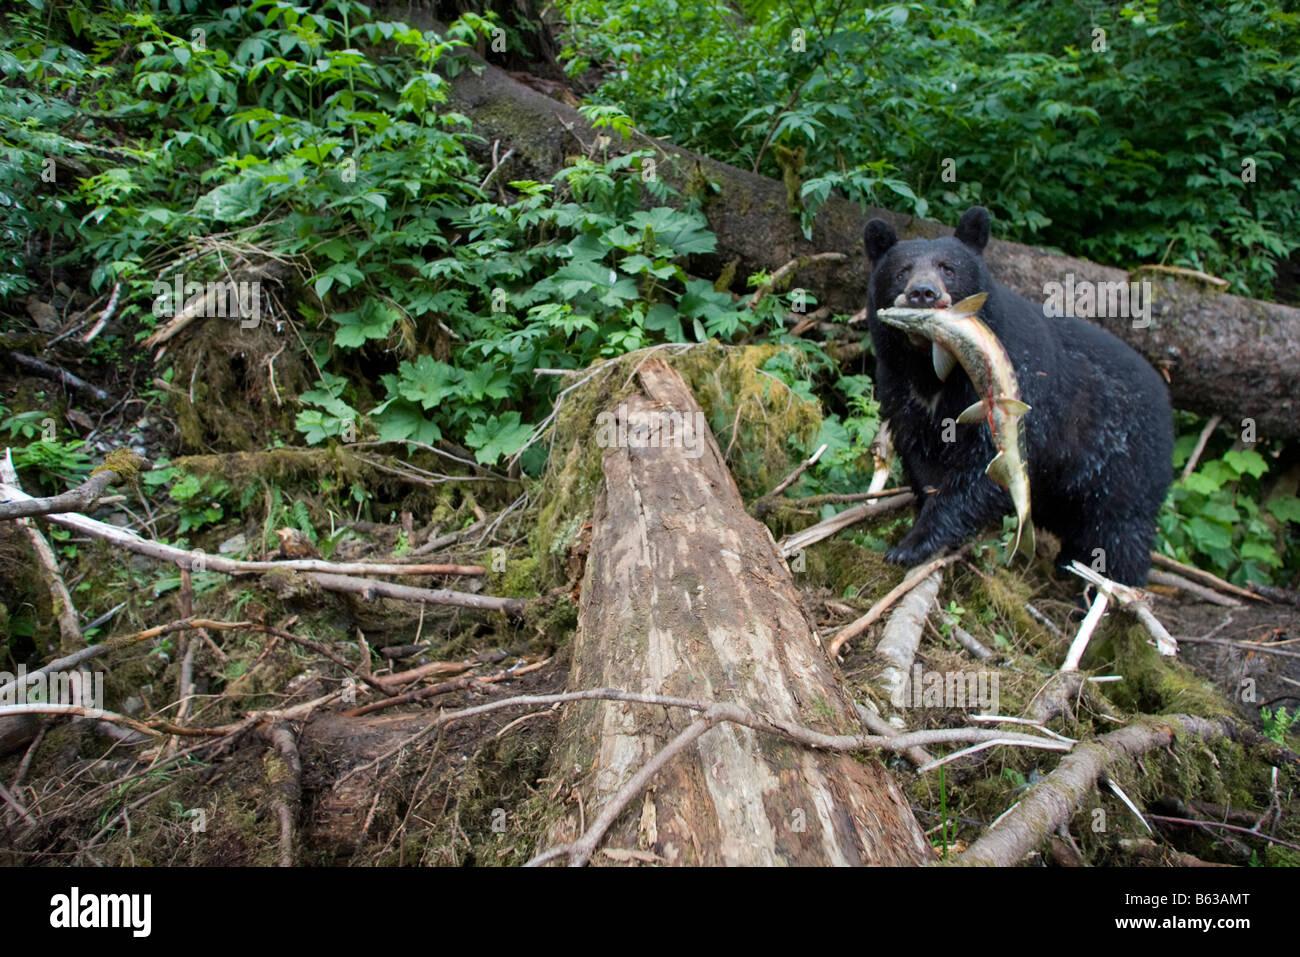 USA Alaska Kake Remote camera view of Black Bear Ursus americanus walking carrying Chum Salmon Oncorhynchus keta - Stock Image